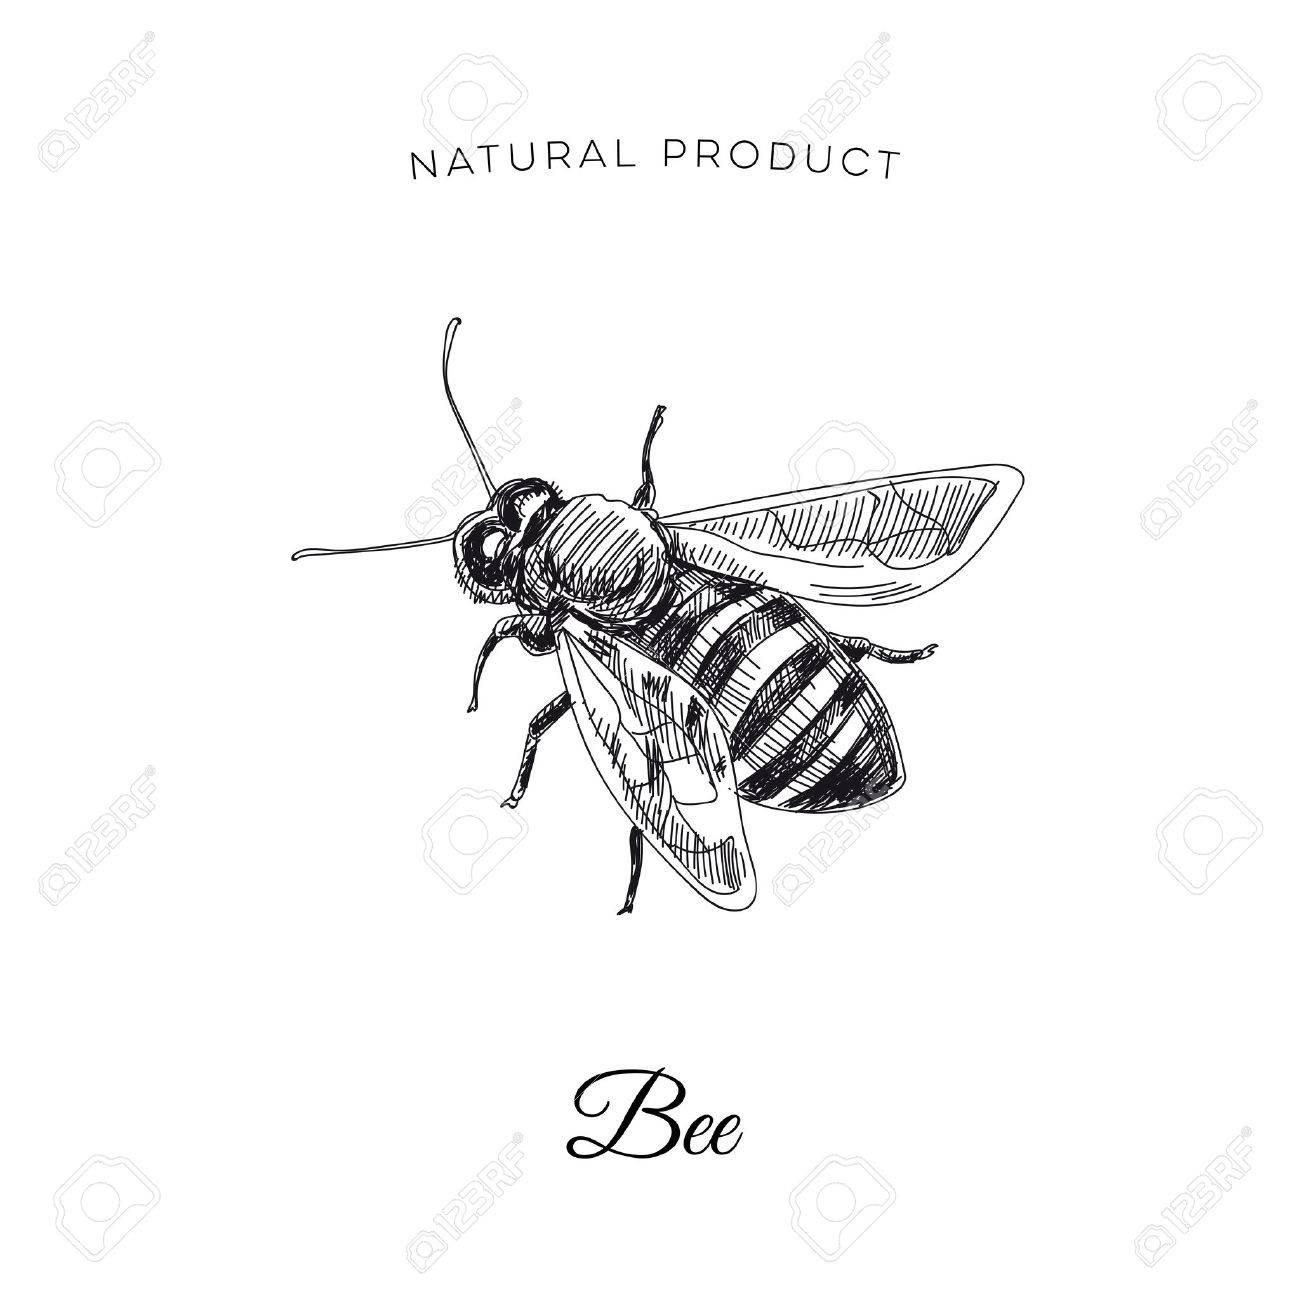 Vector hand drawn honey bee Illustration. Sketch vintage style. Design template. Retro background. - 75684158